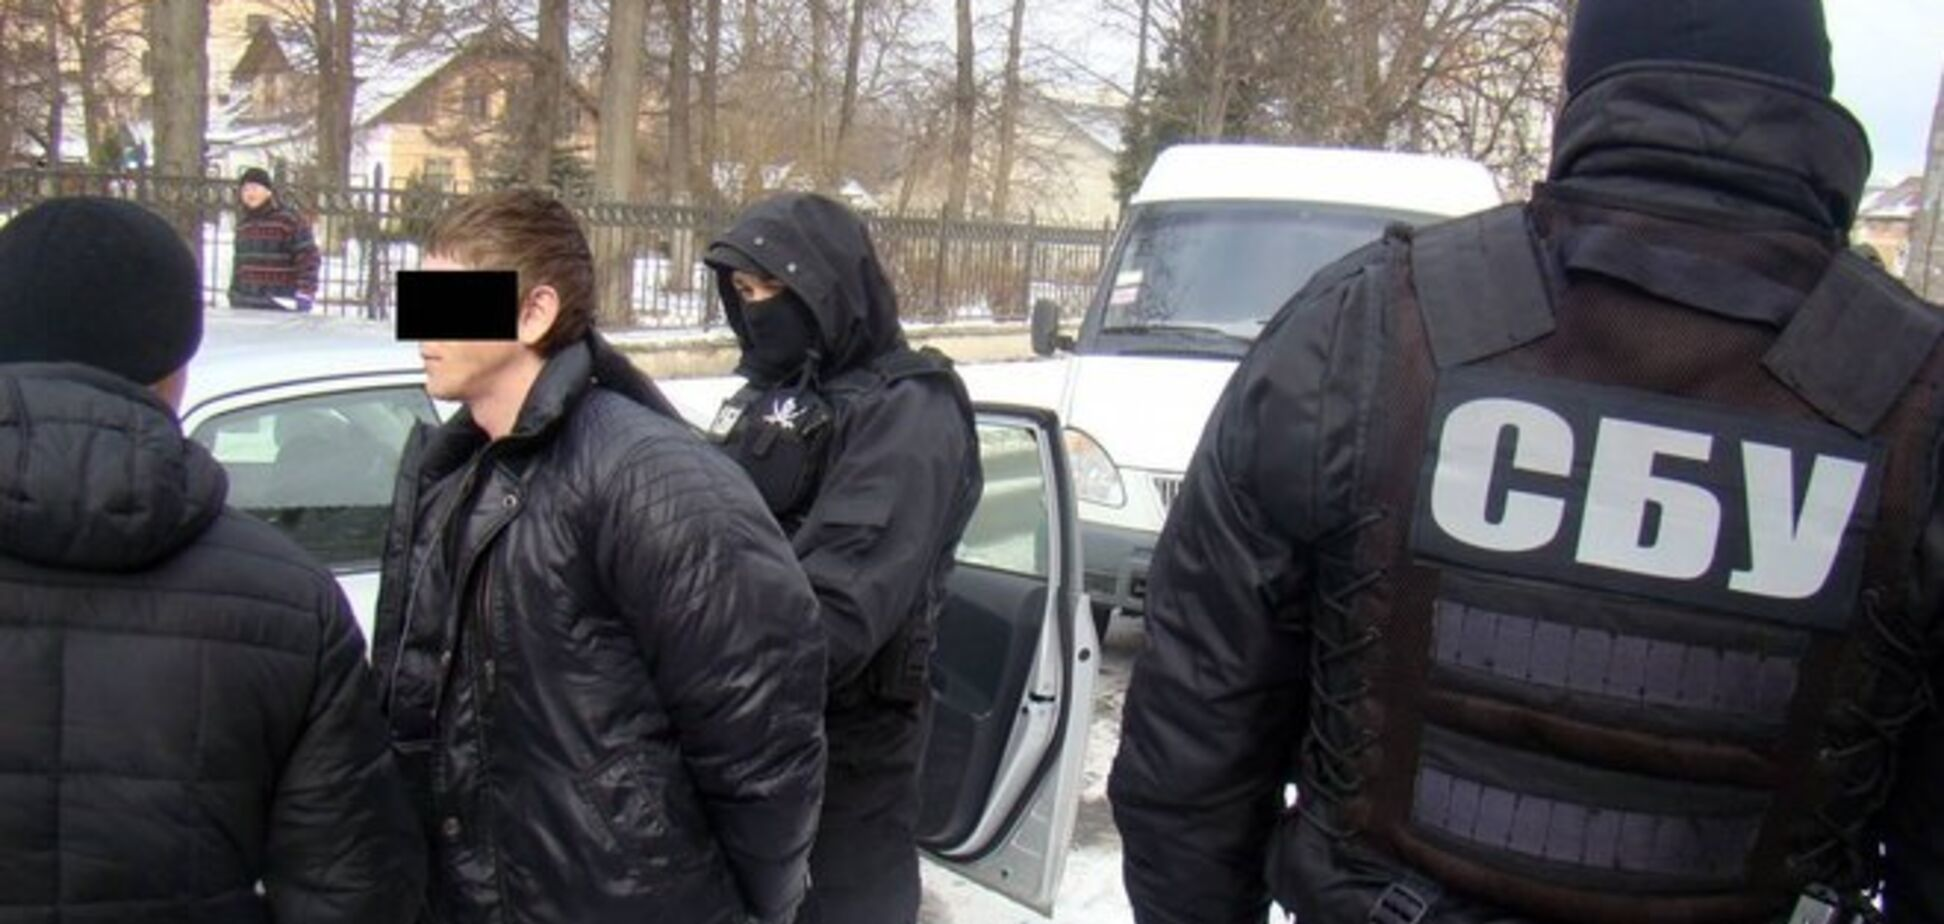 Служба безопасности задержала контрабандиста 'шпионской' аппаратуры